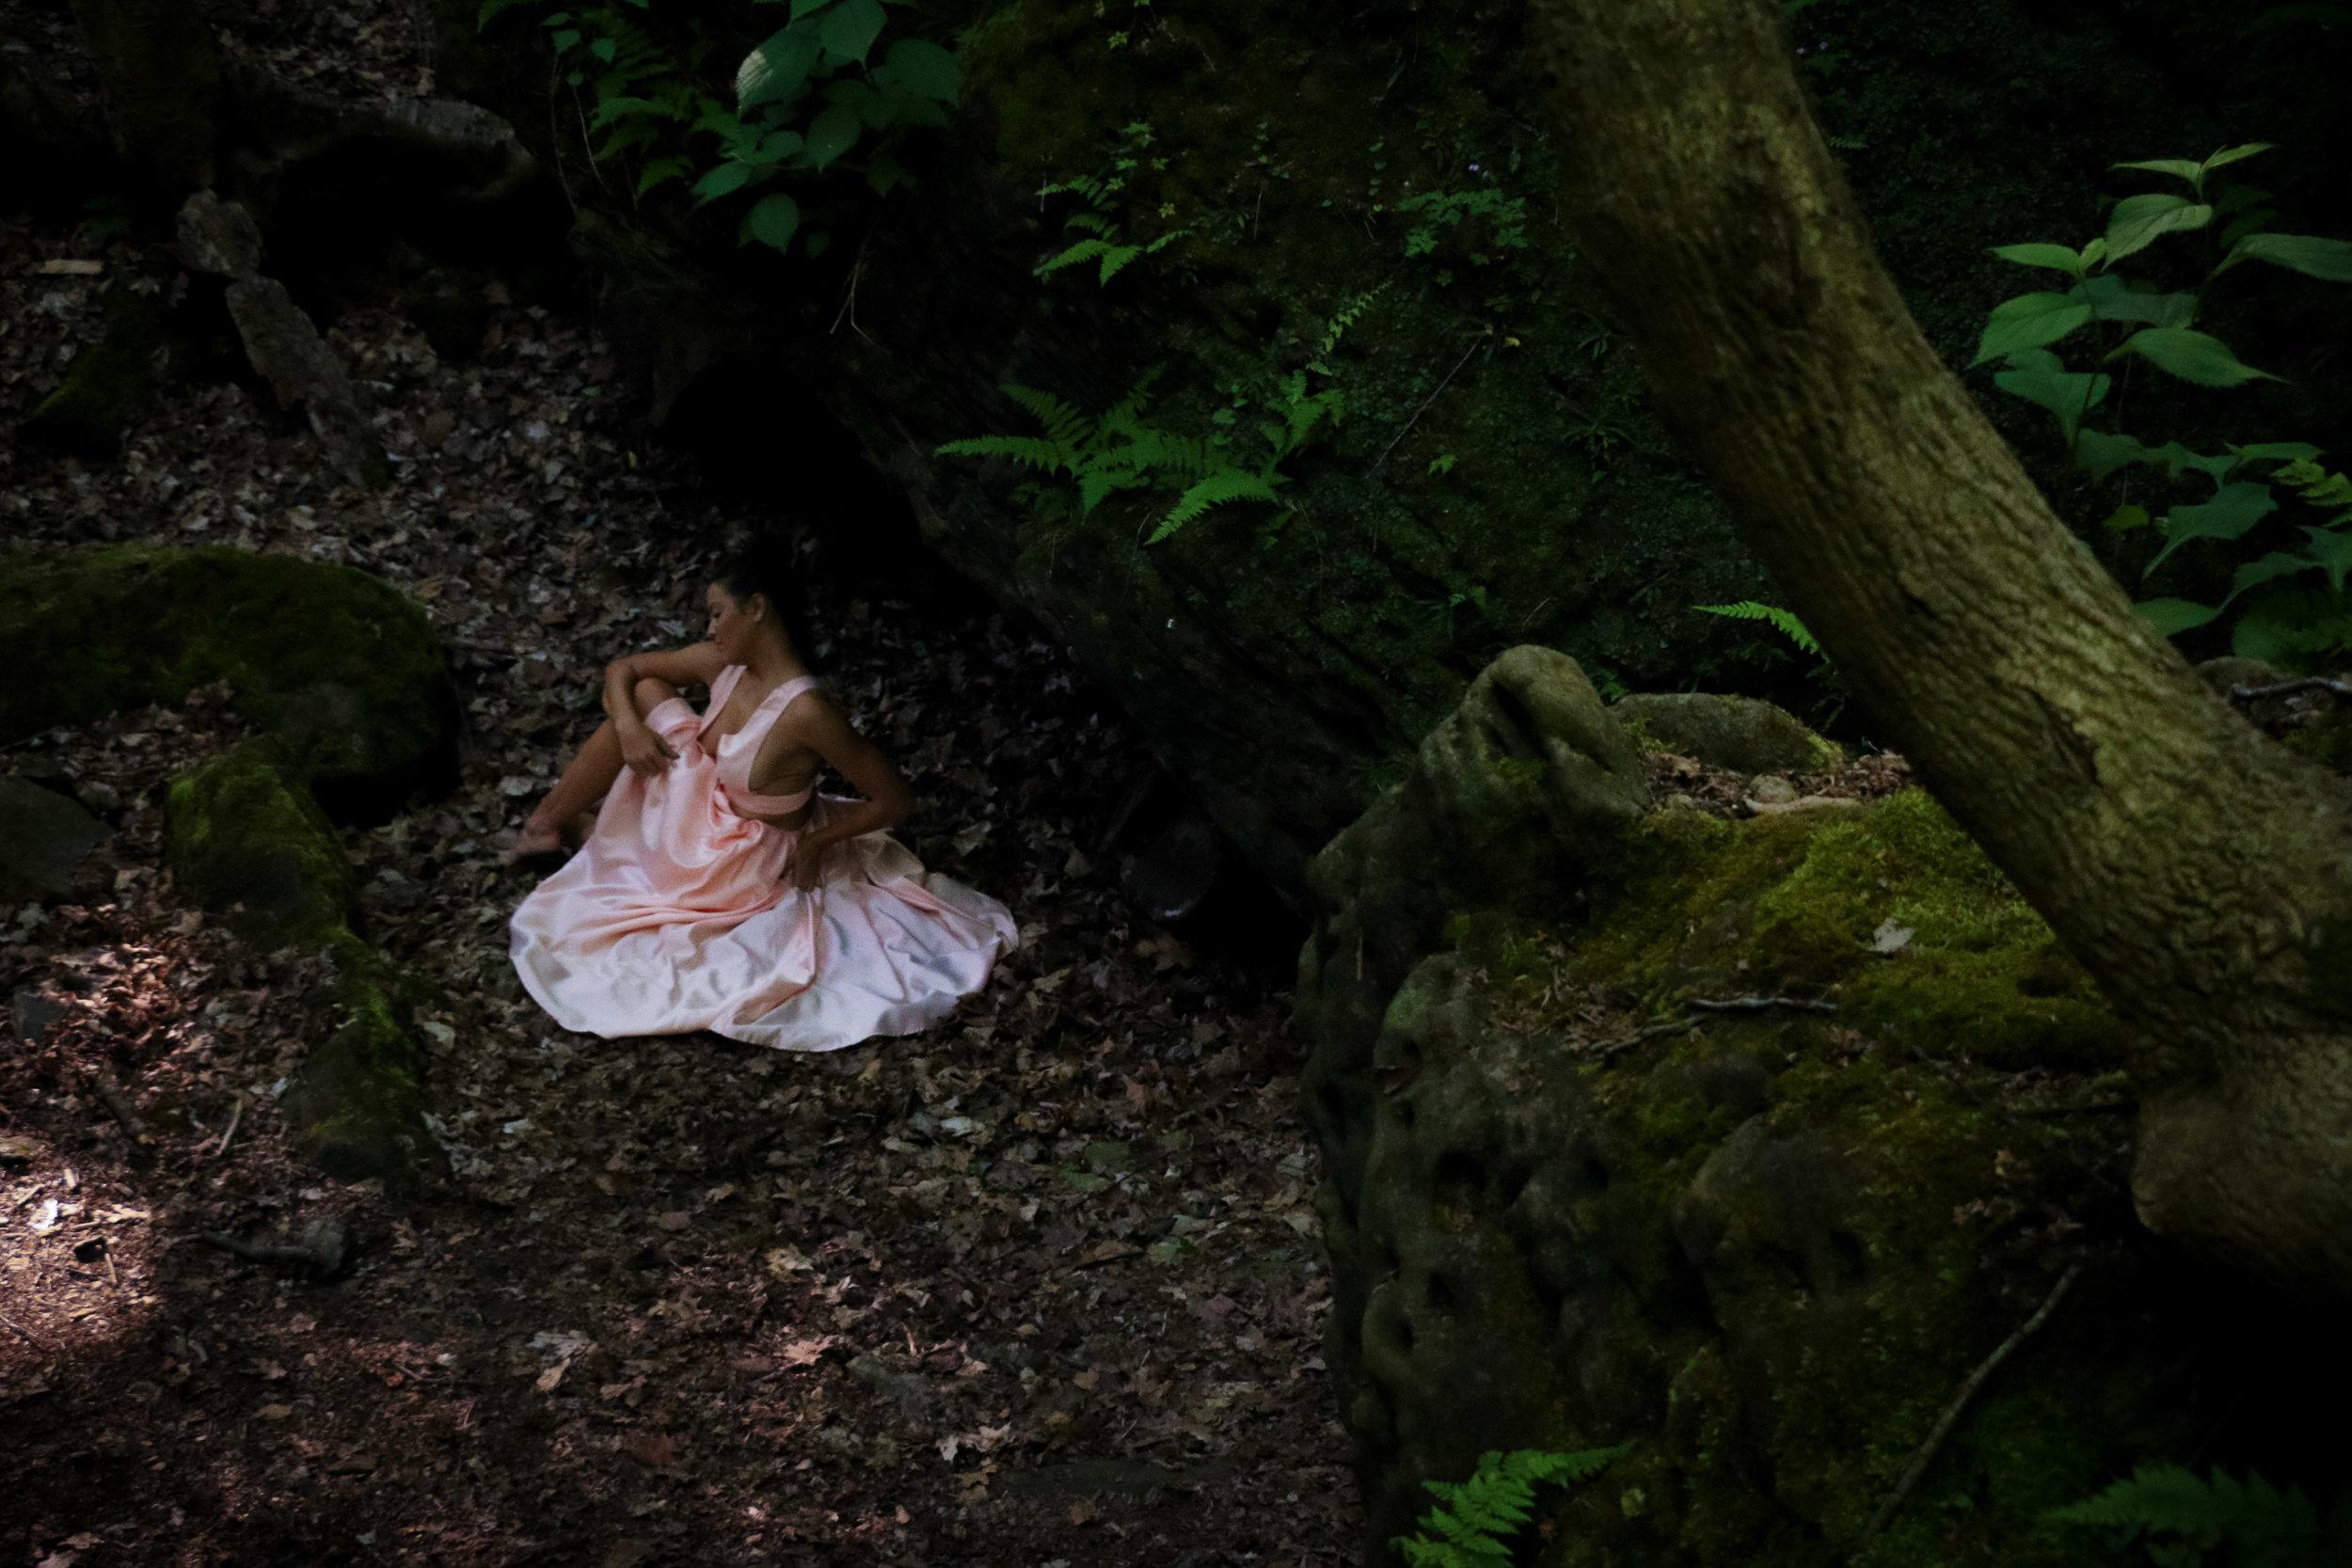 Deanna-Gorge-June17-2.jpg